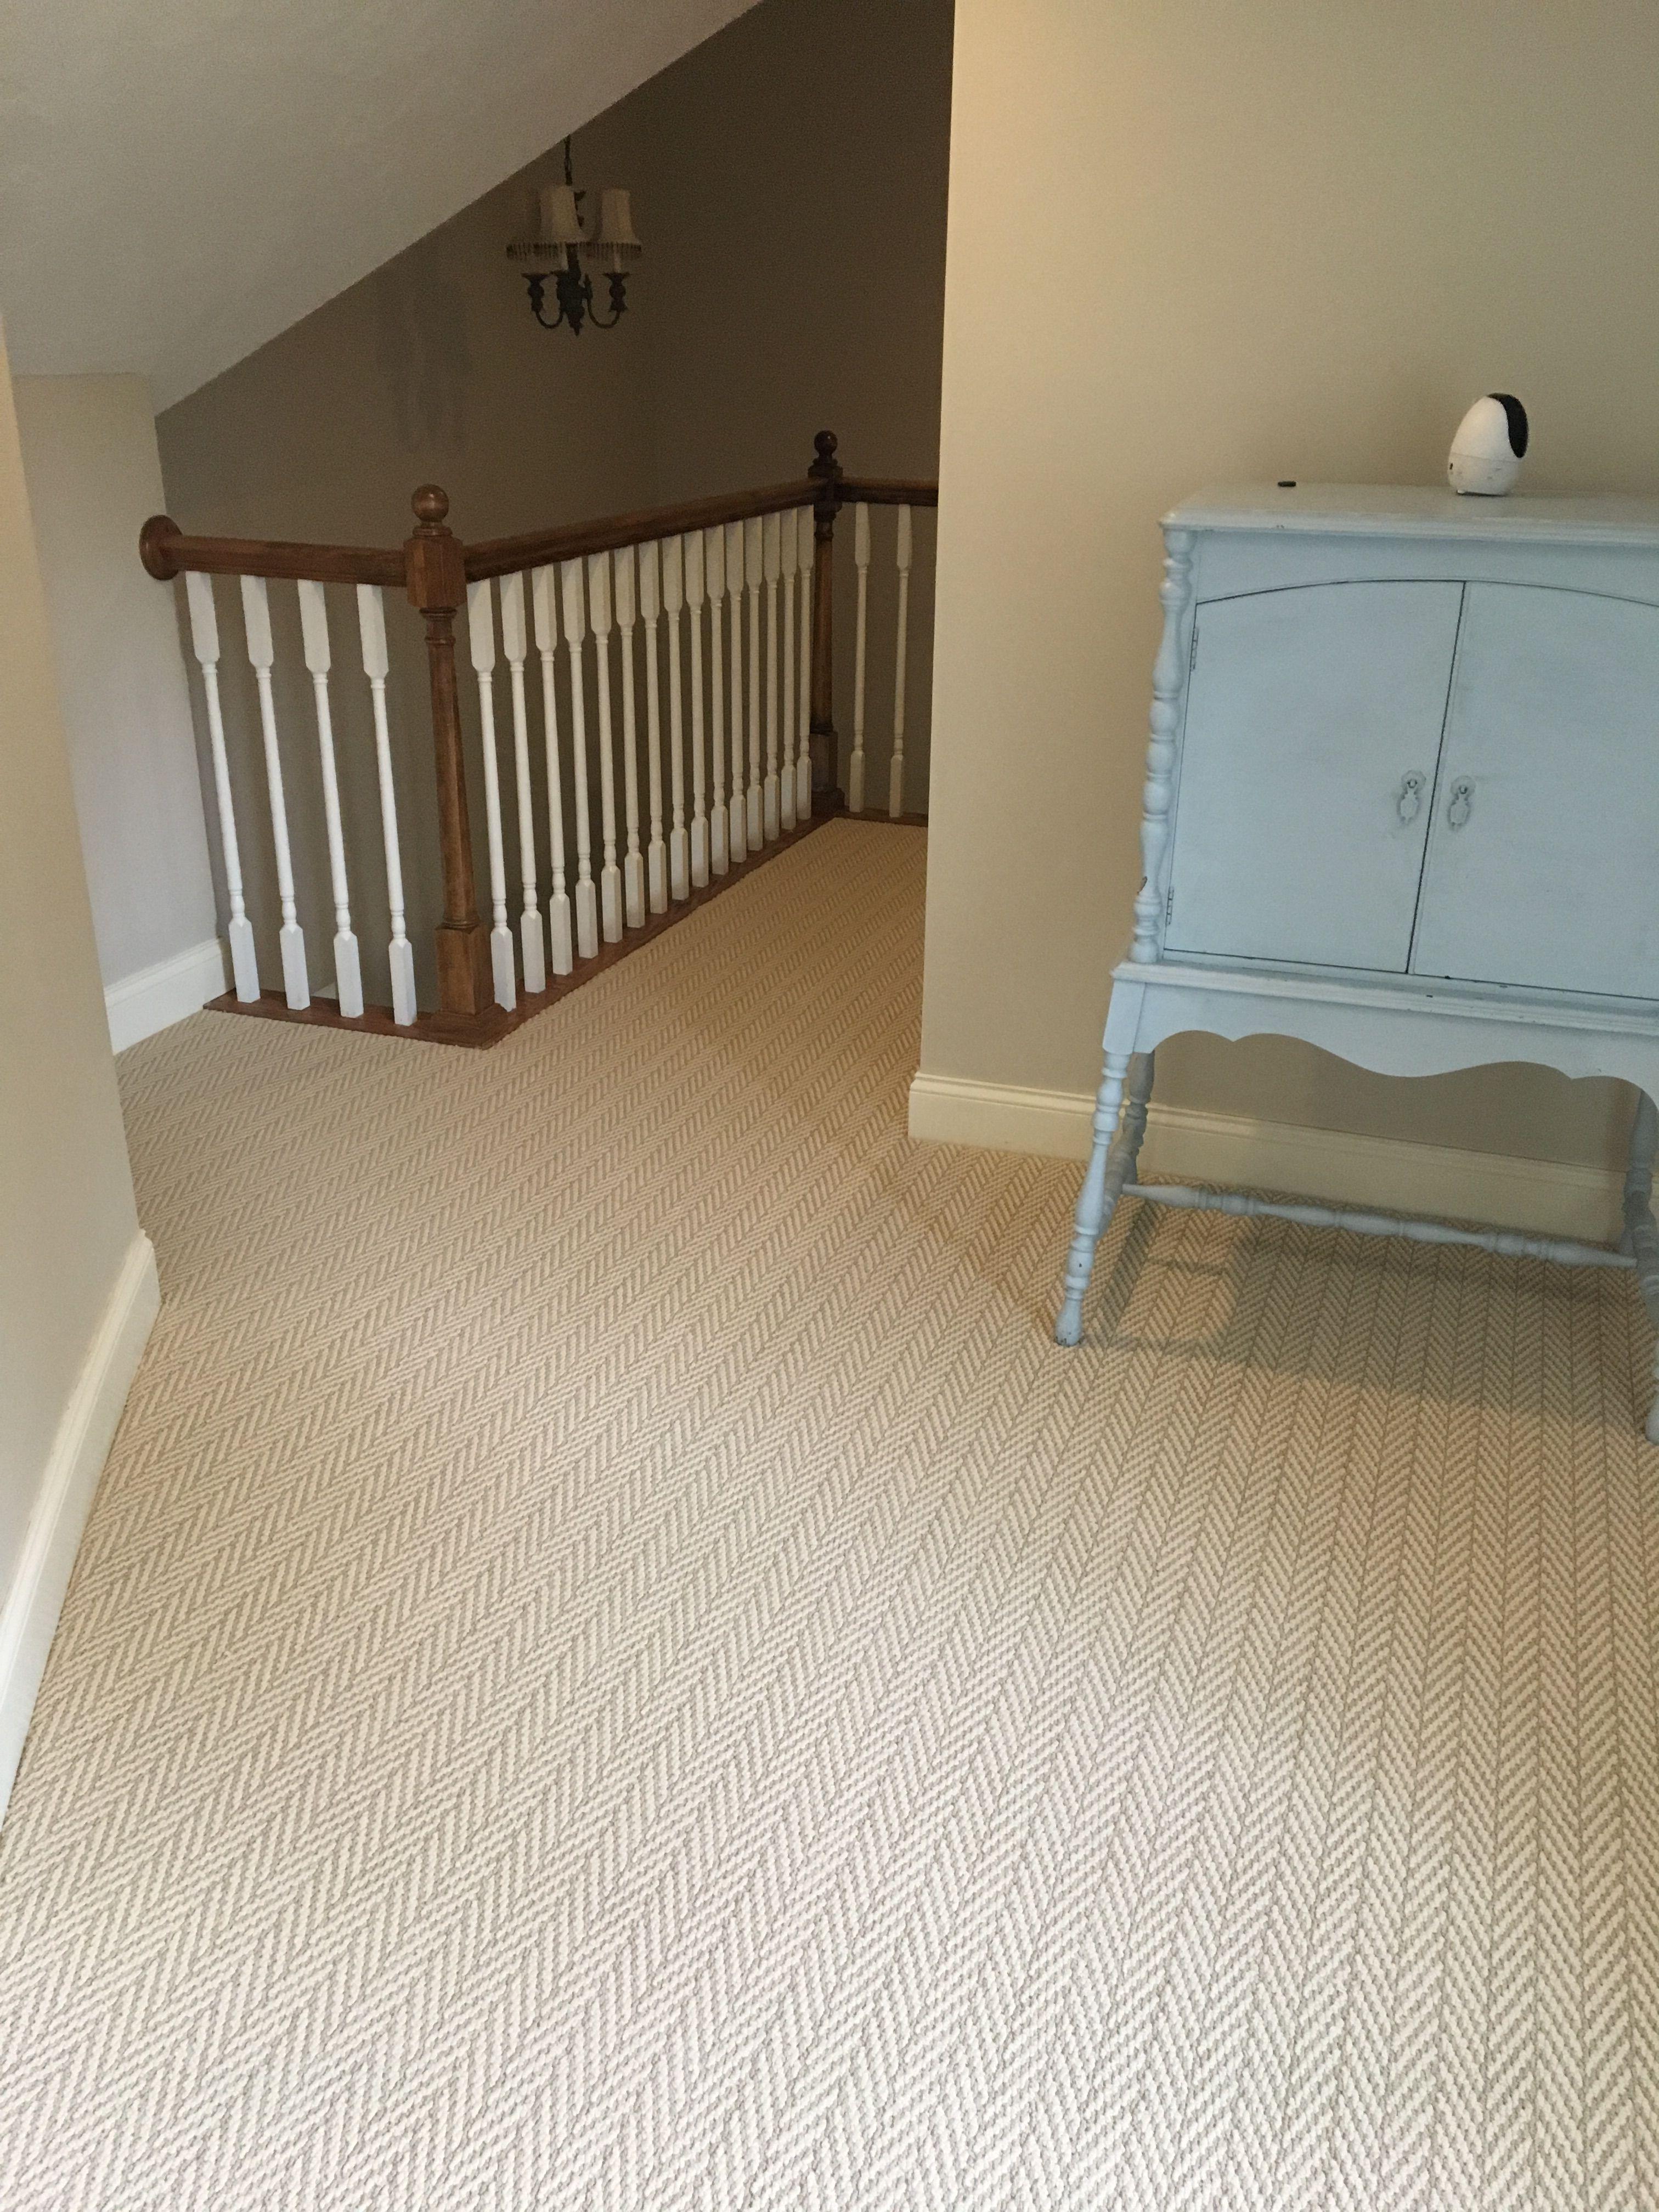 Lowes Stainmaster Apparent Beauty Whisper Berber Carpet ...